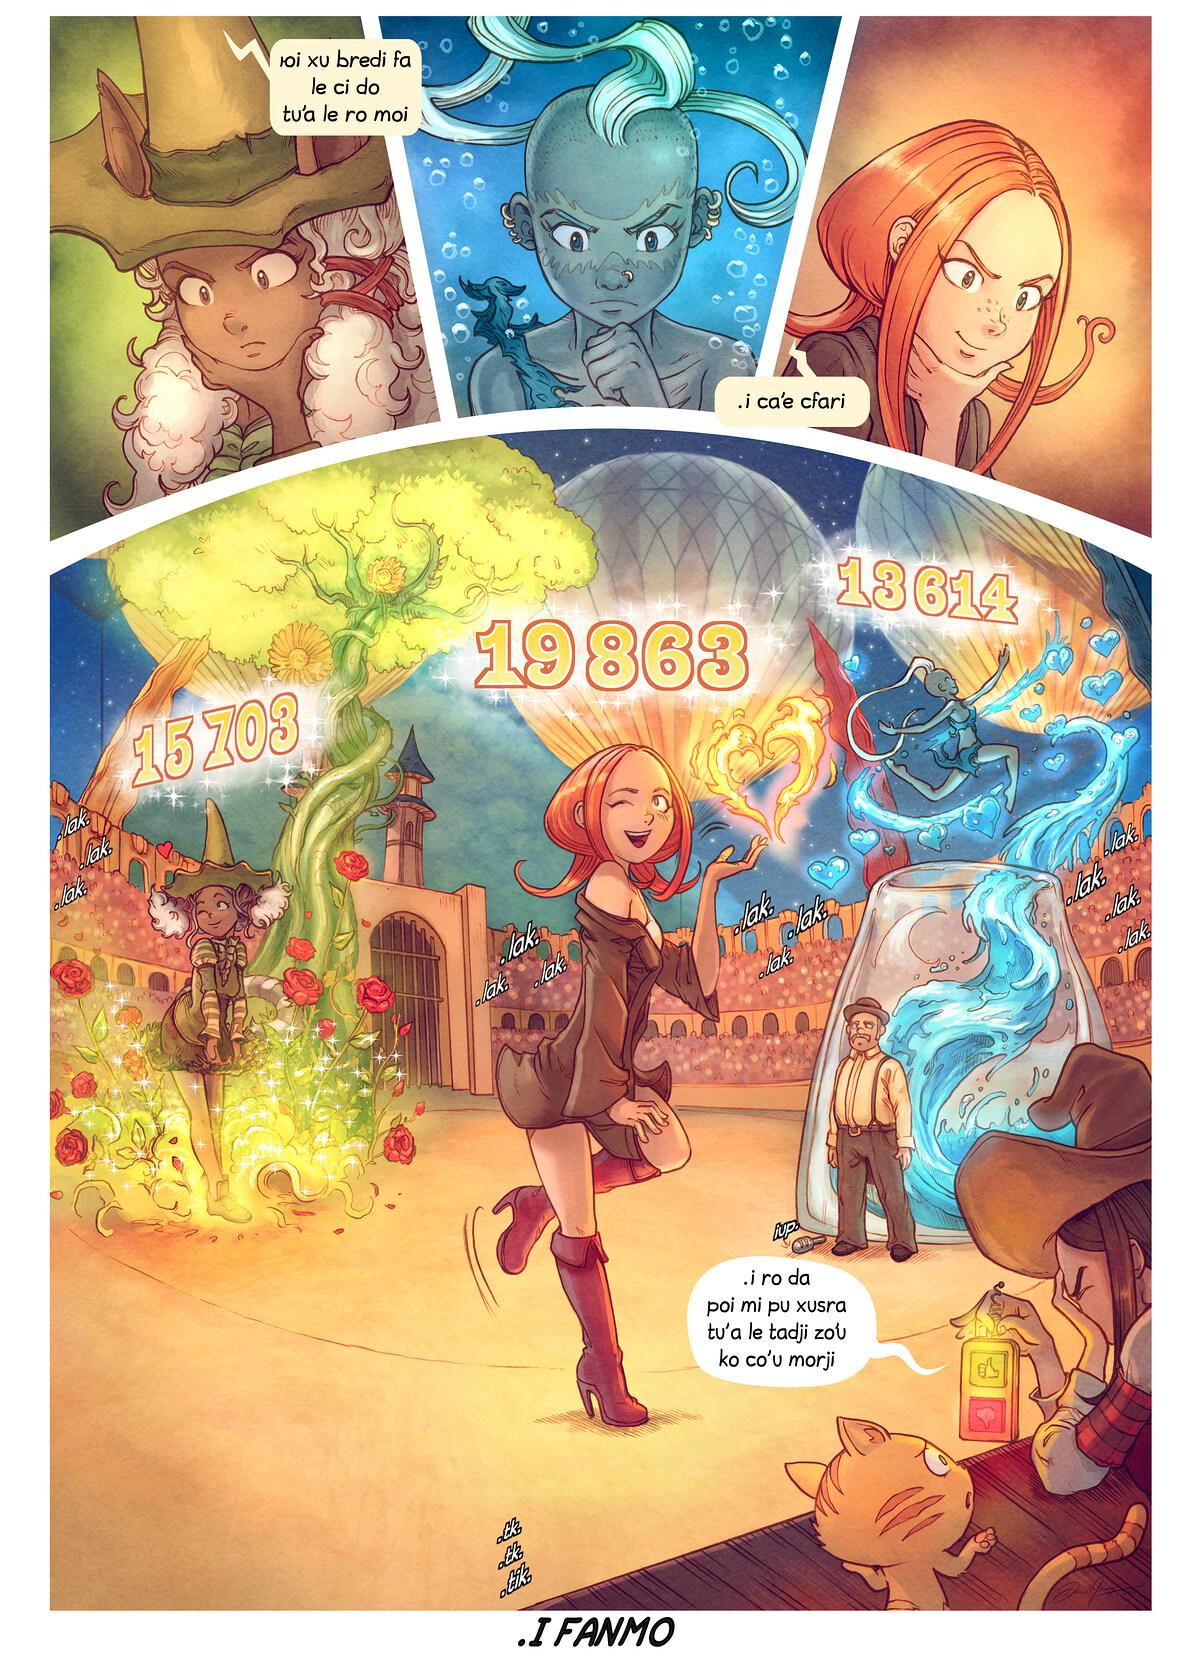 A webcomic page of Pepper&Carrot, pagbu 22 [jb], papri 10